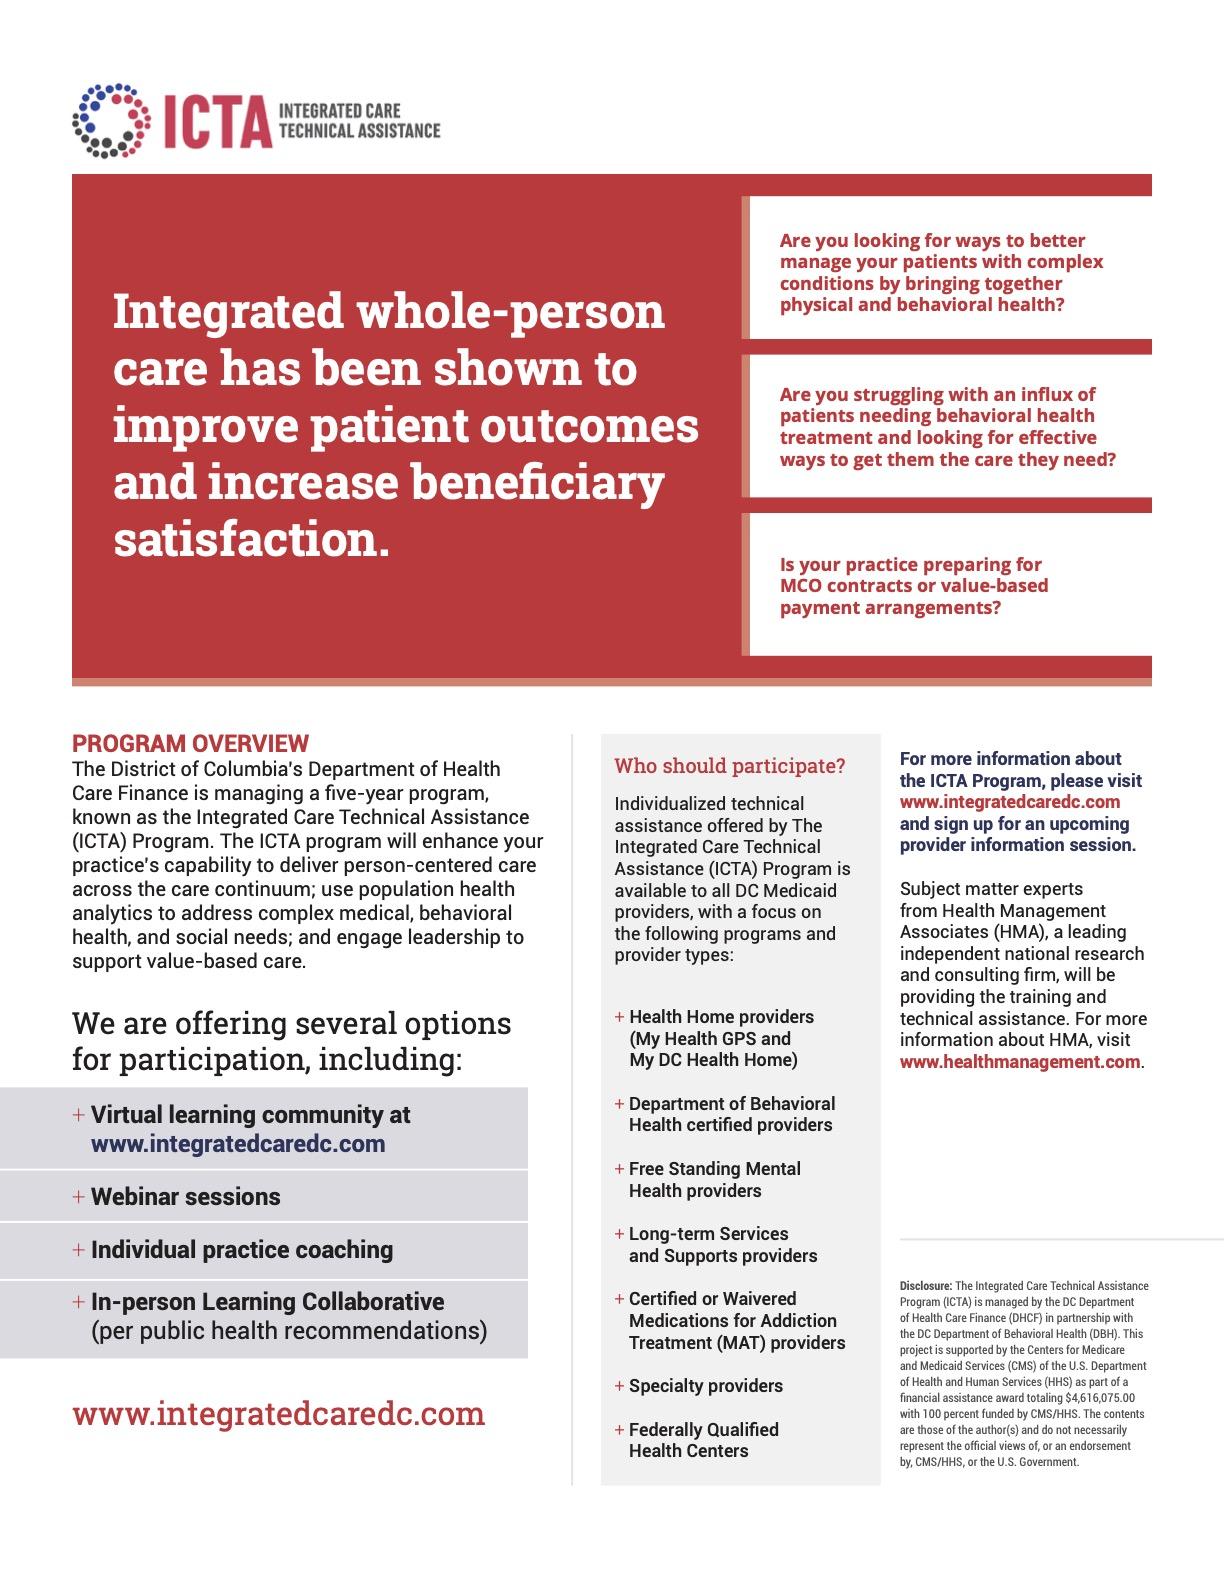 HMA Integrated Care Technical Assistance Handout